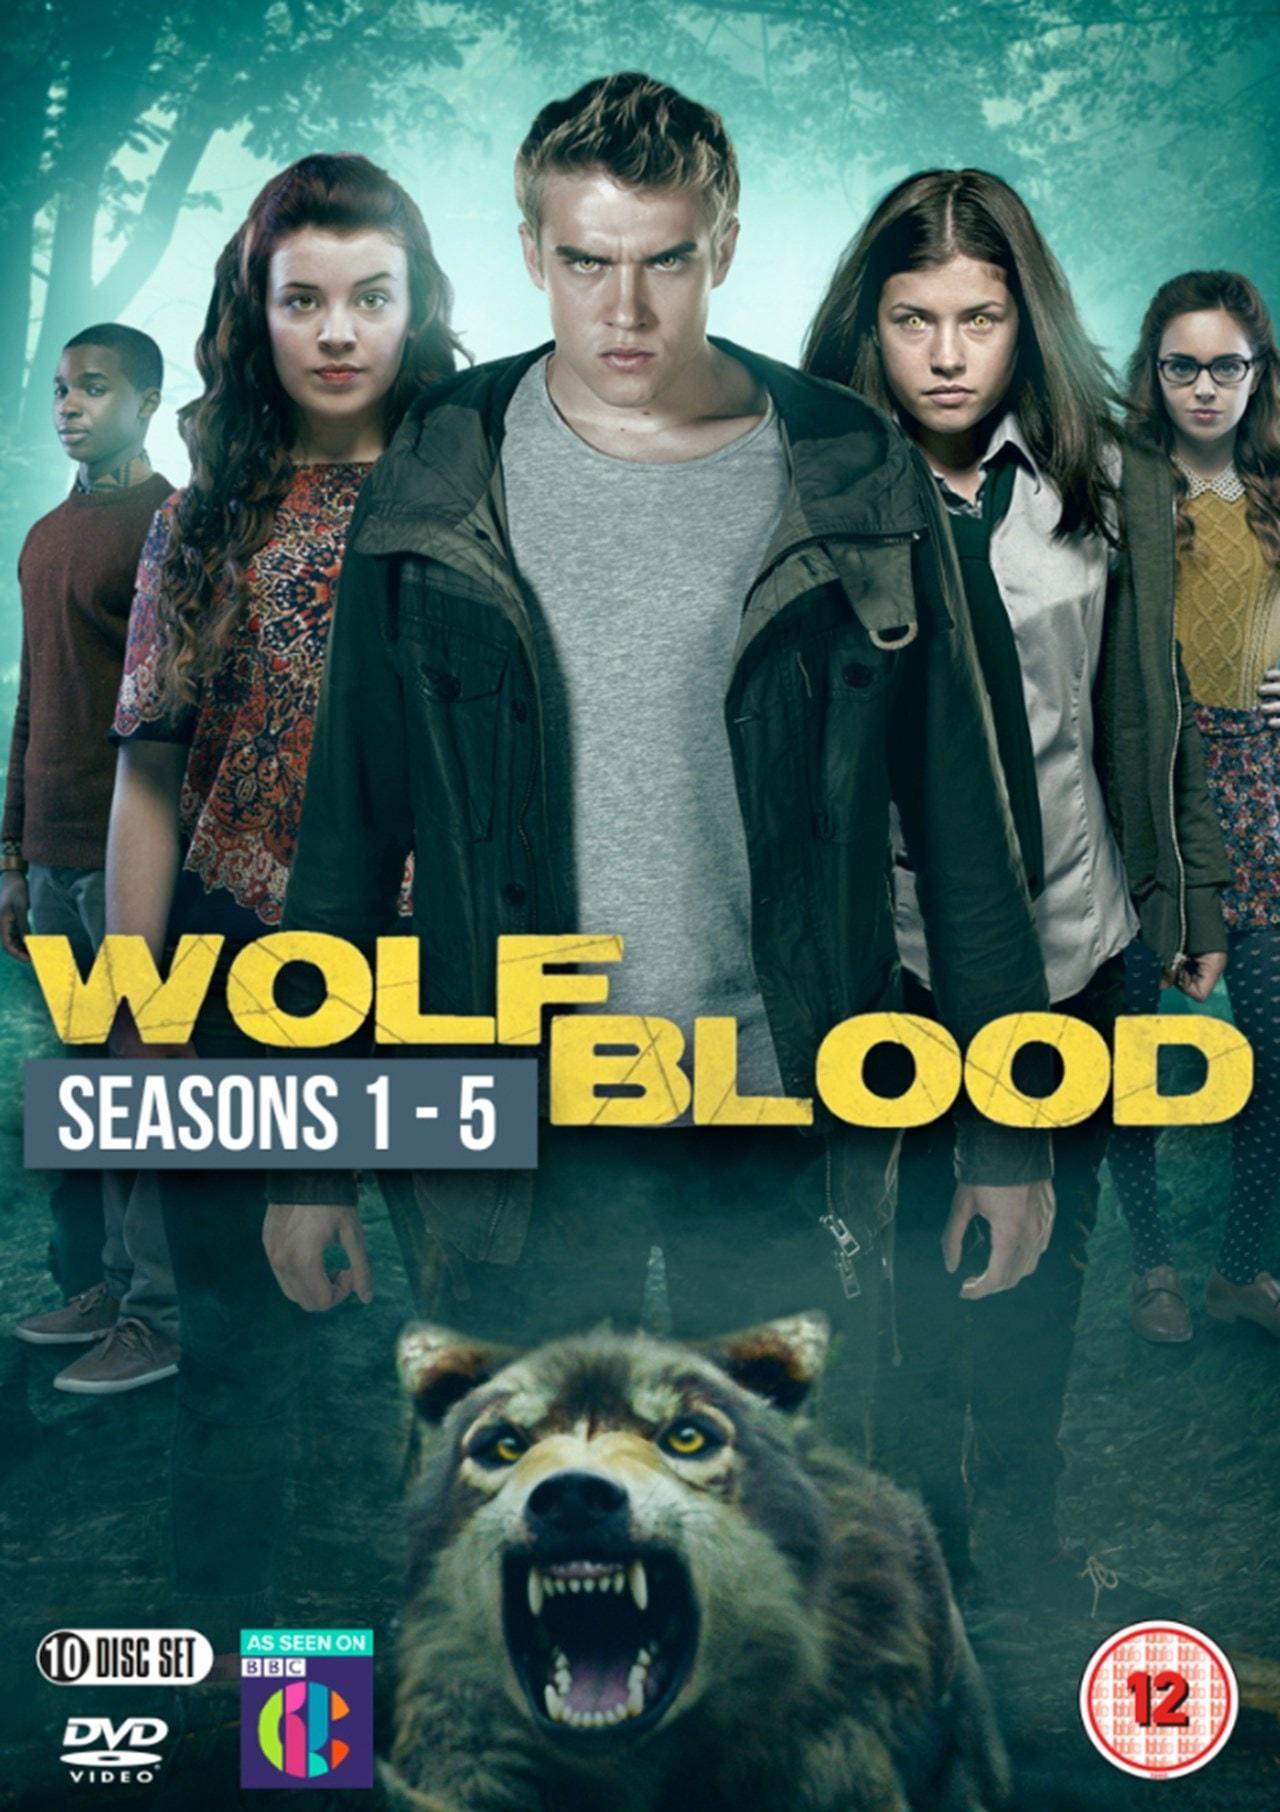 Wolfblood: Seasons 1-5 - 1